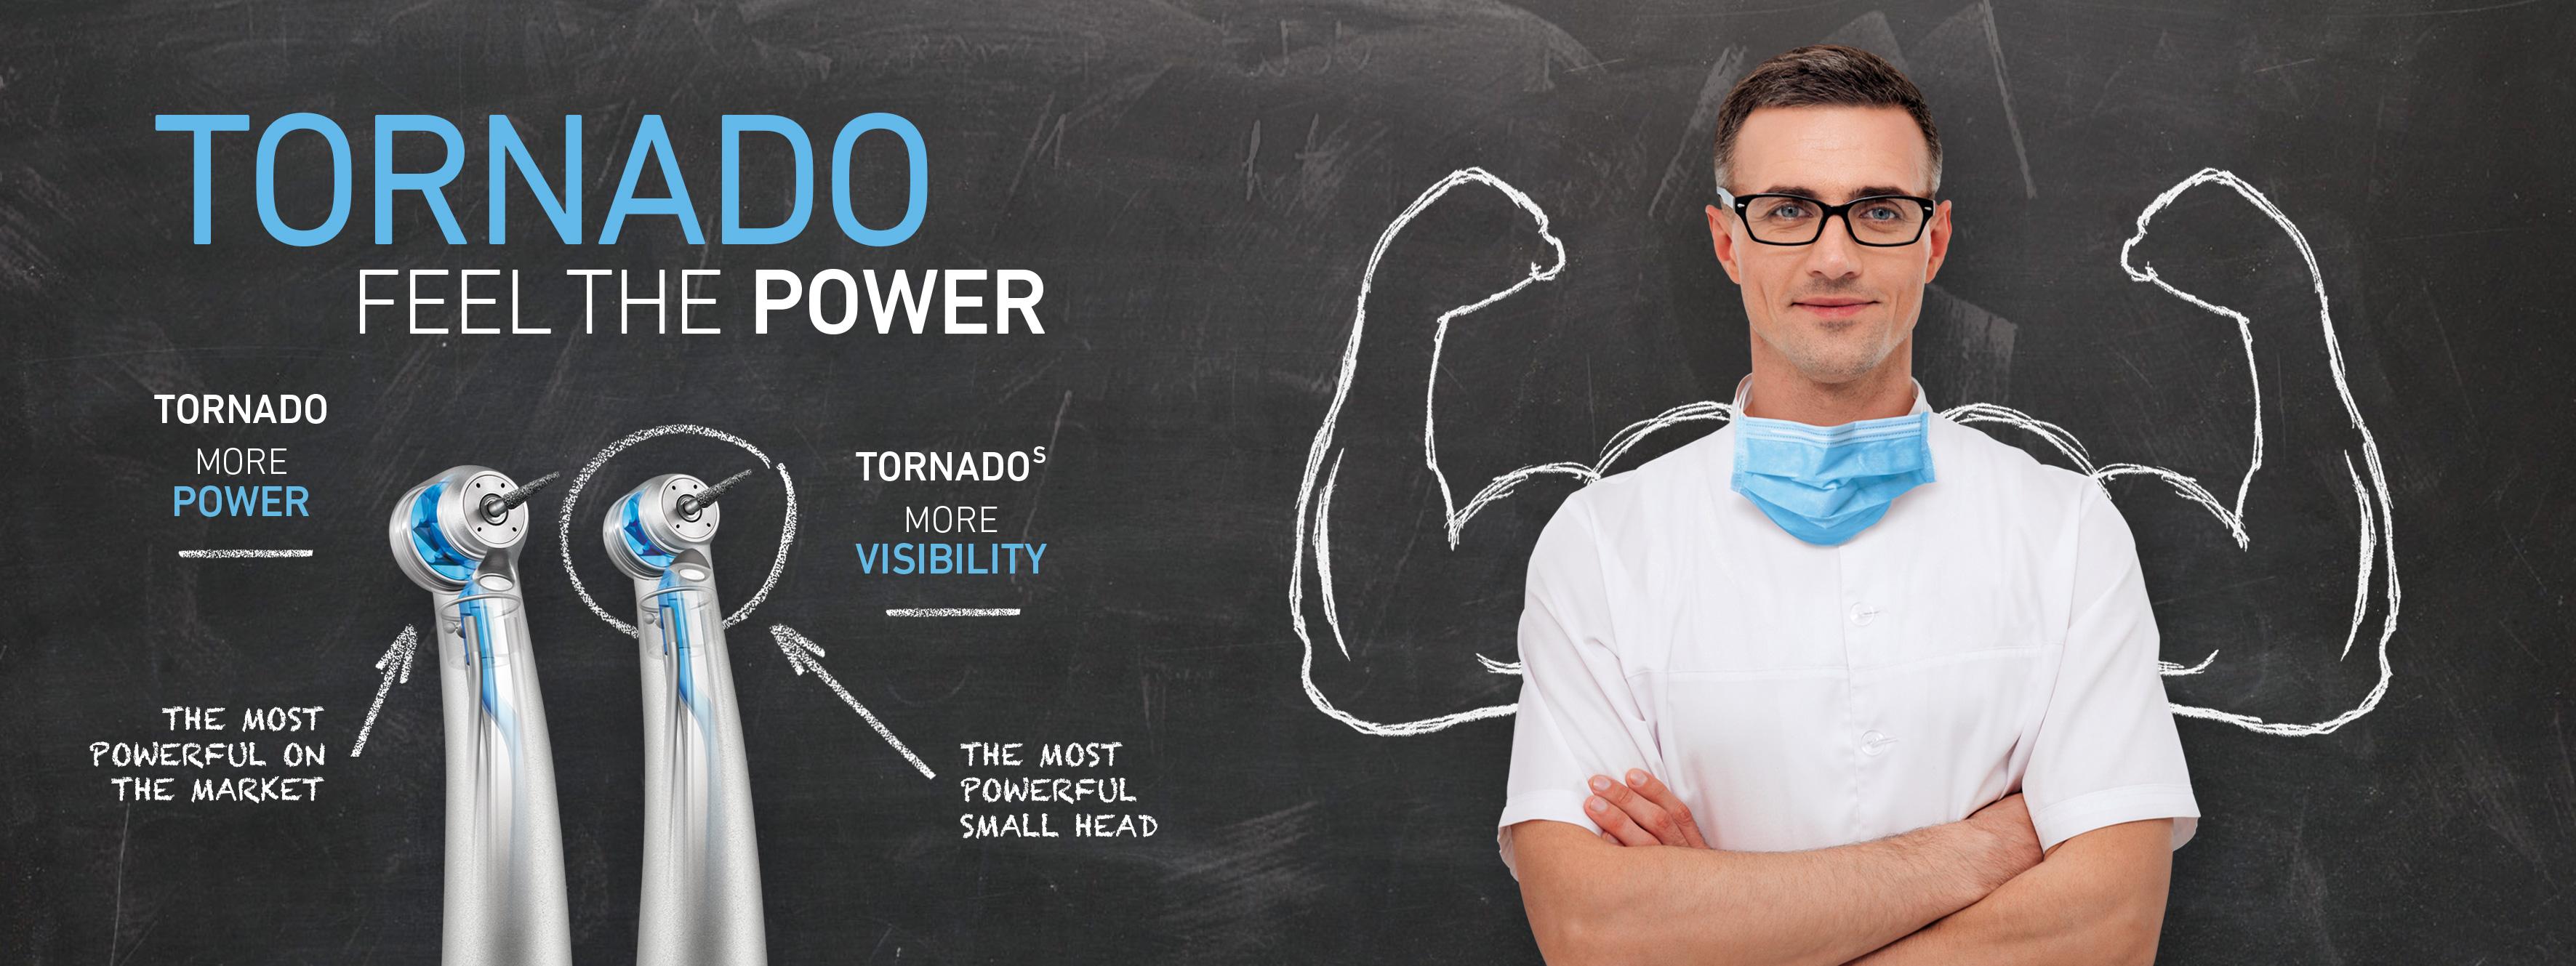 Preorder your TornadoS